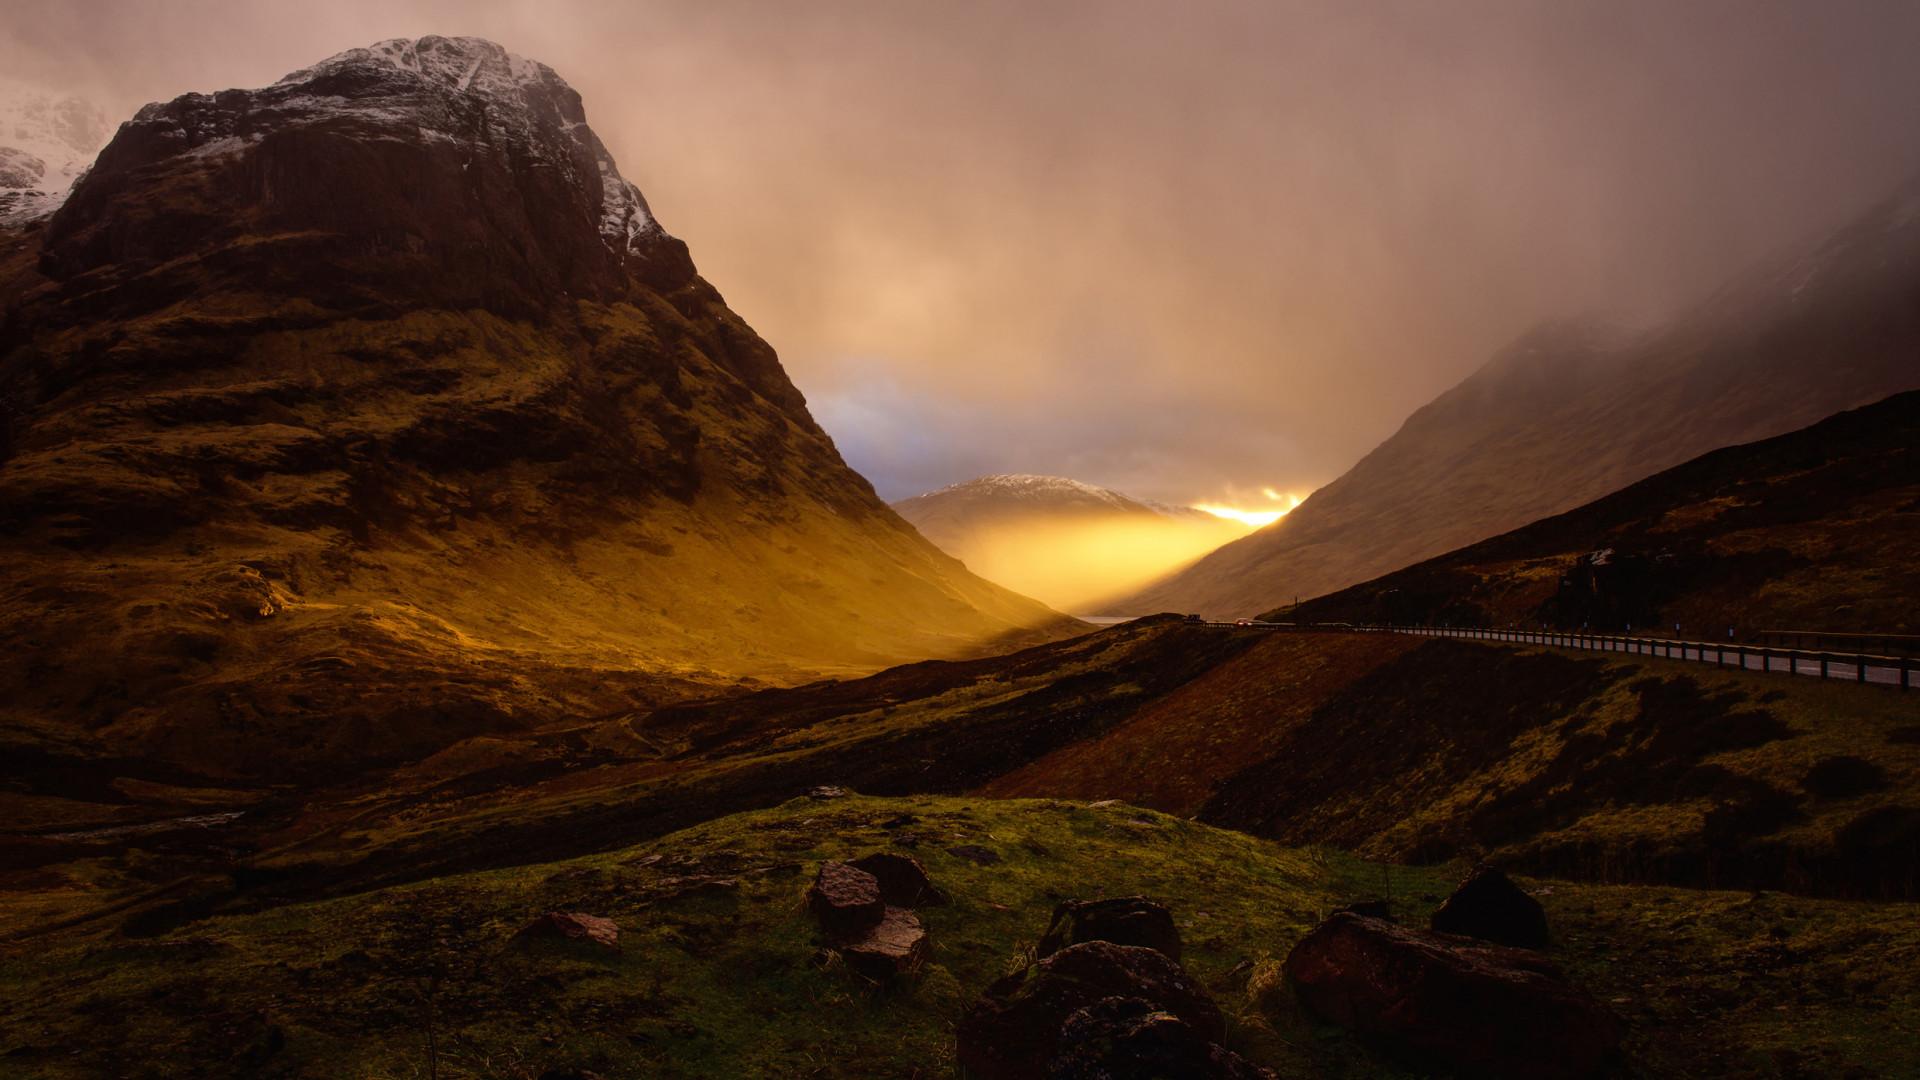 Glowing sunset near Glencoe, Scotland